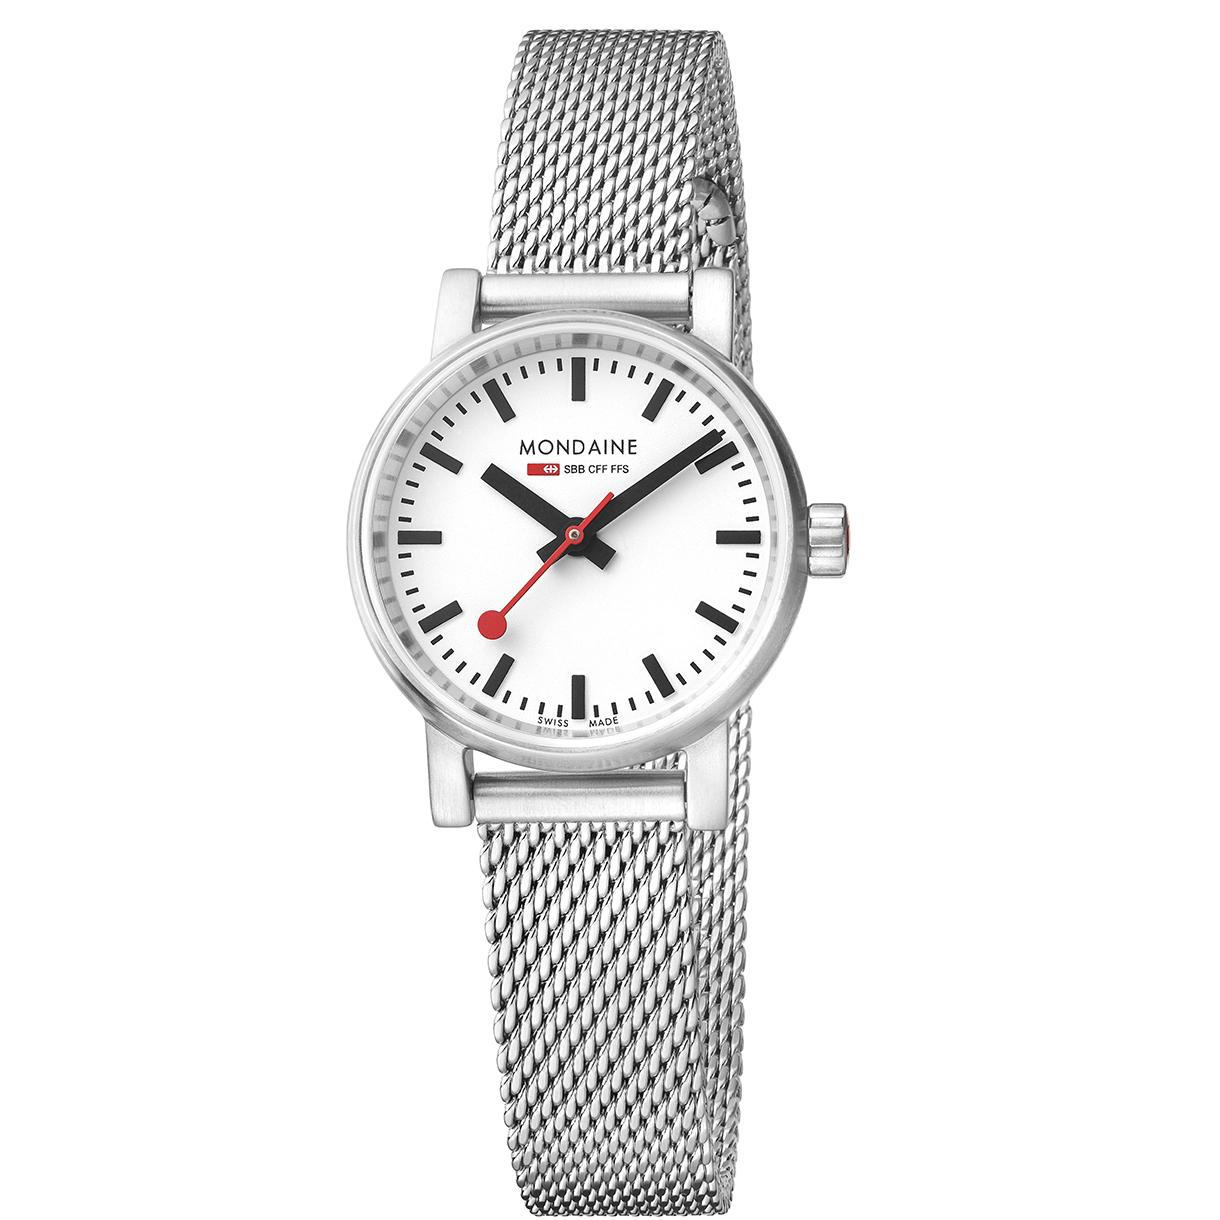 Mondaine evo2 petite mondaine watches clocks - Mondaine travel clock ...